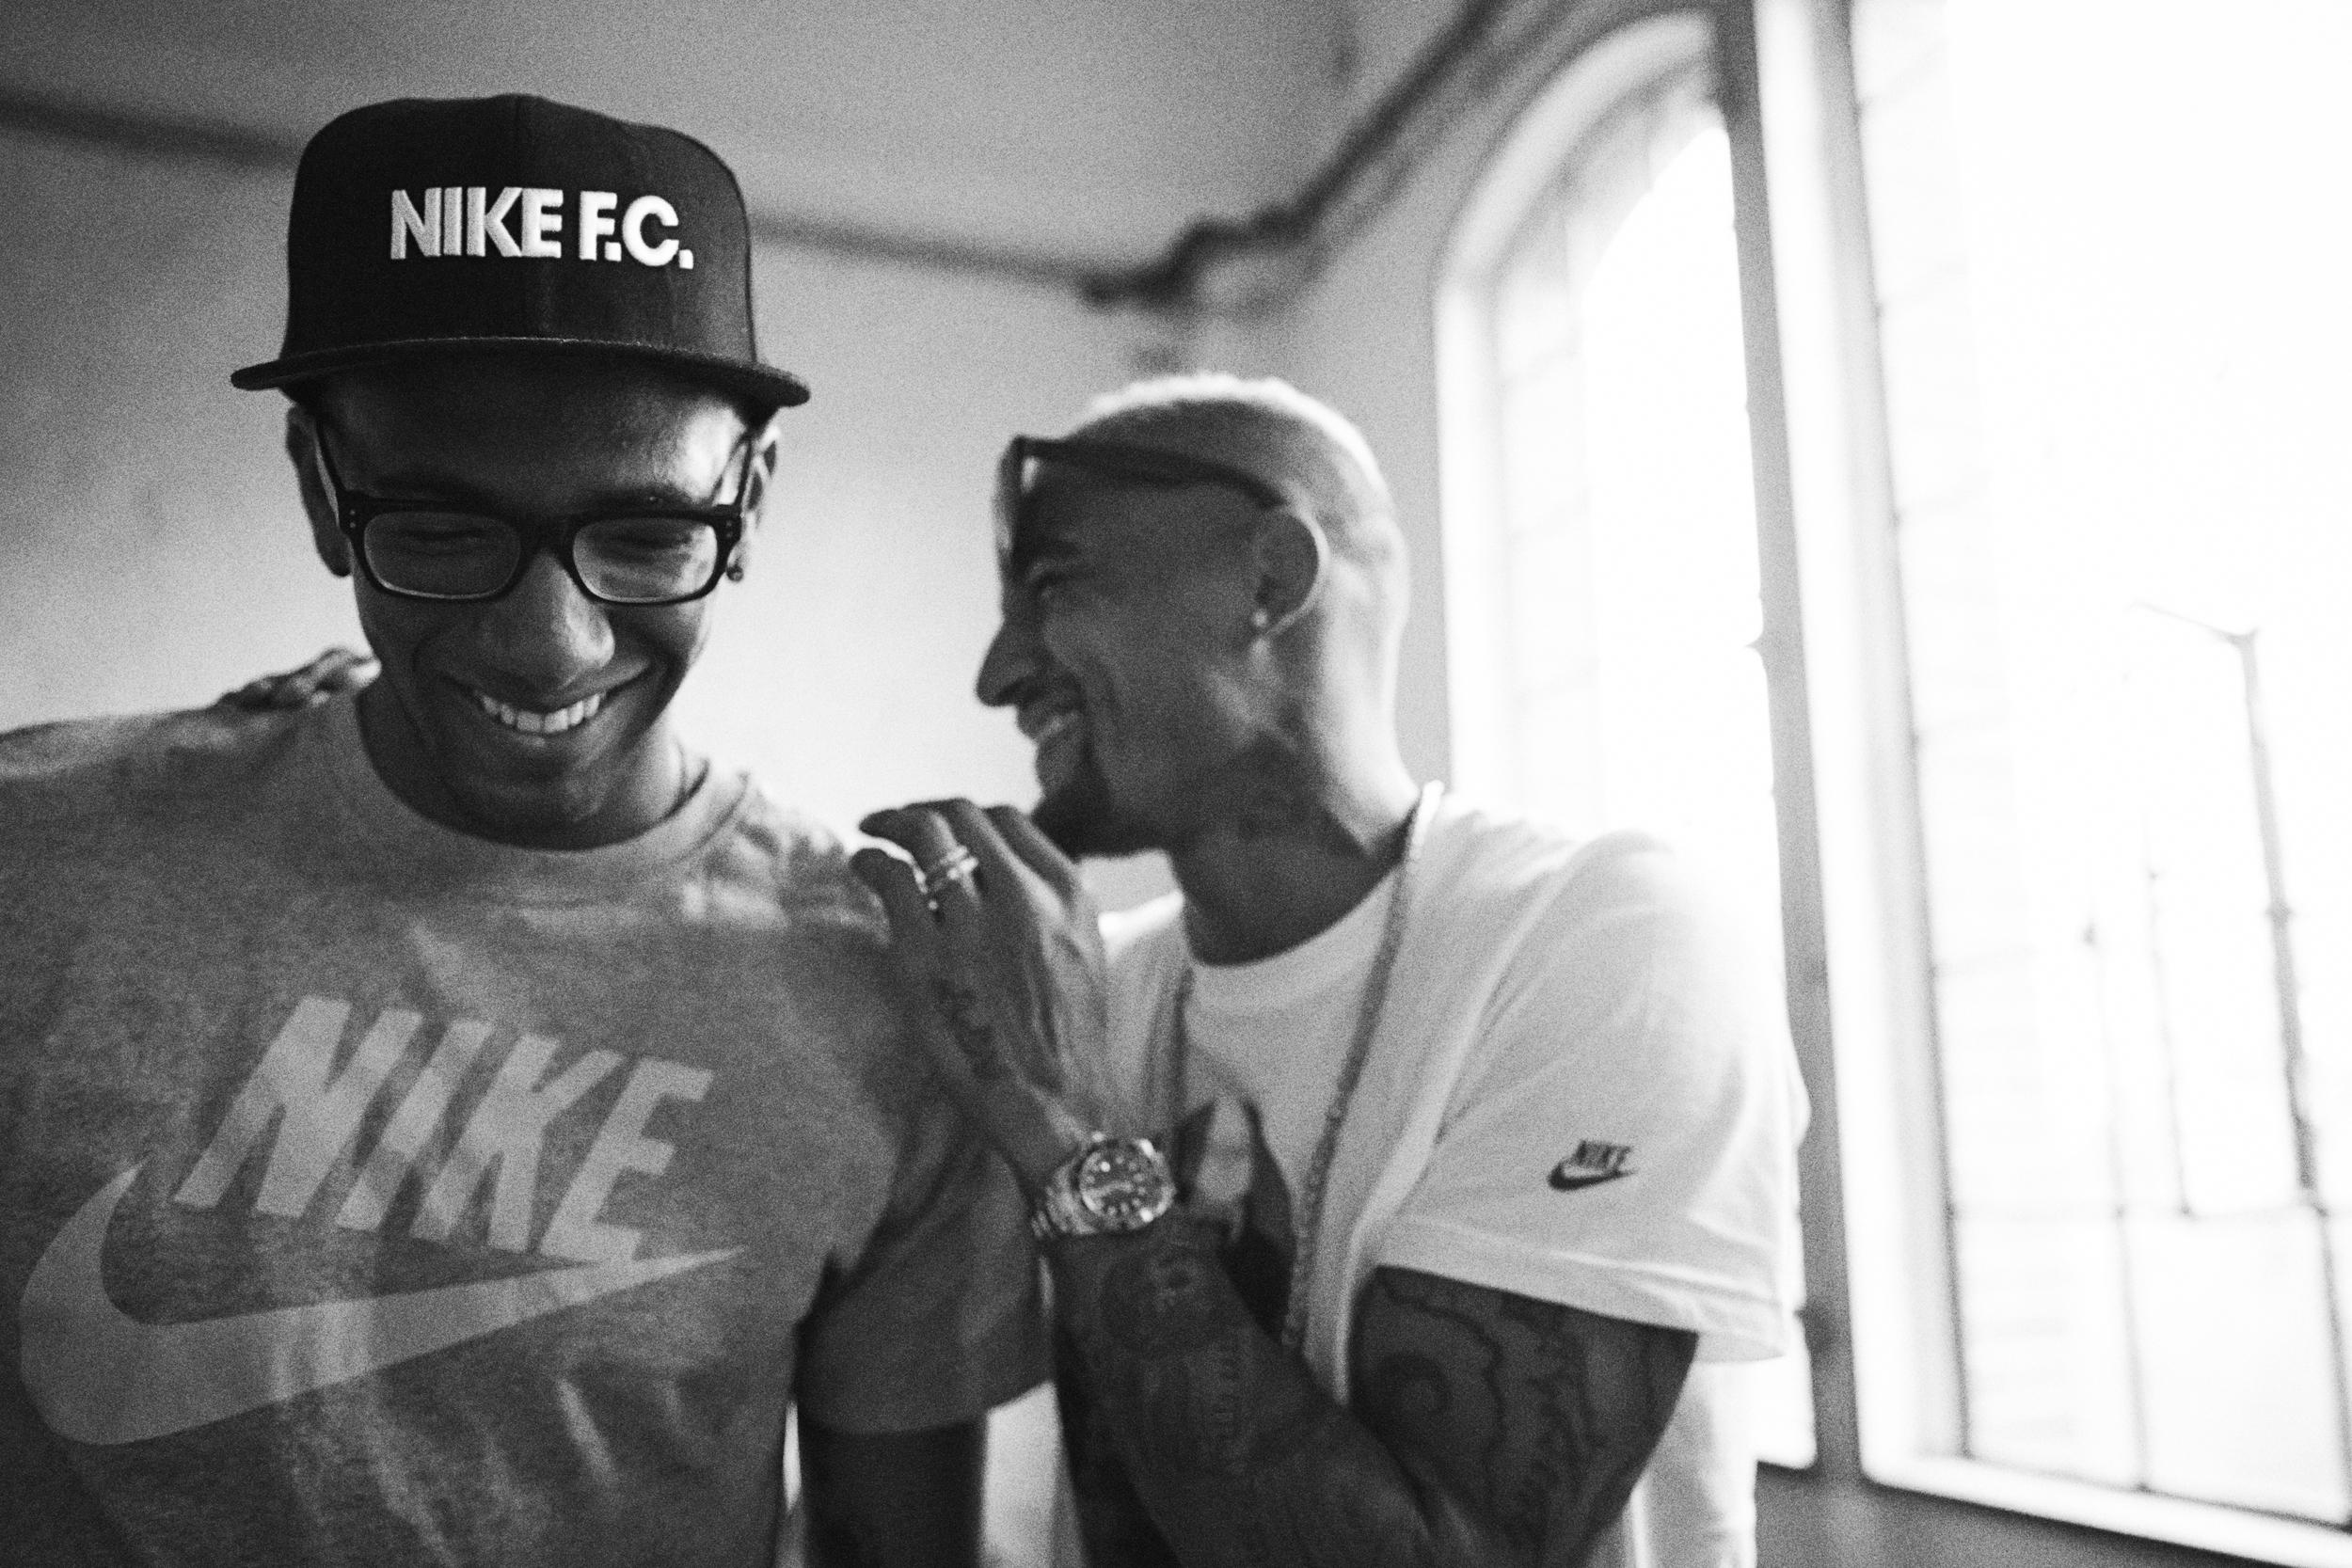 Ho14_NSW_NikeFC_Boateng_Brothers_L_001_original.jpg